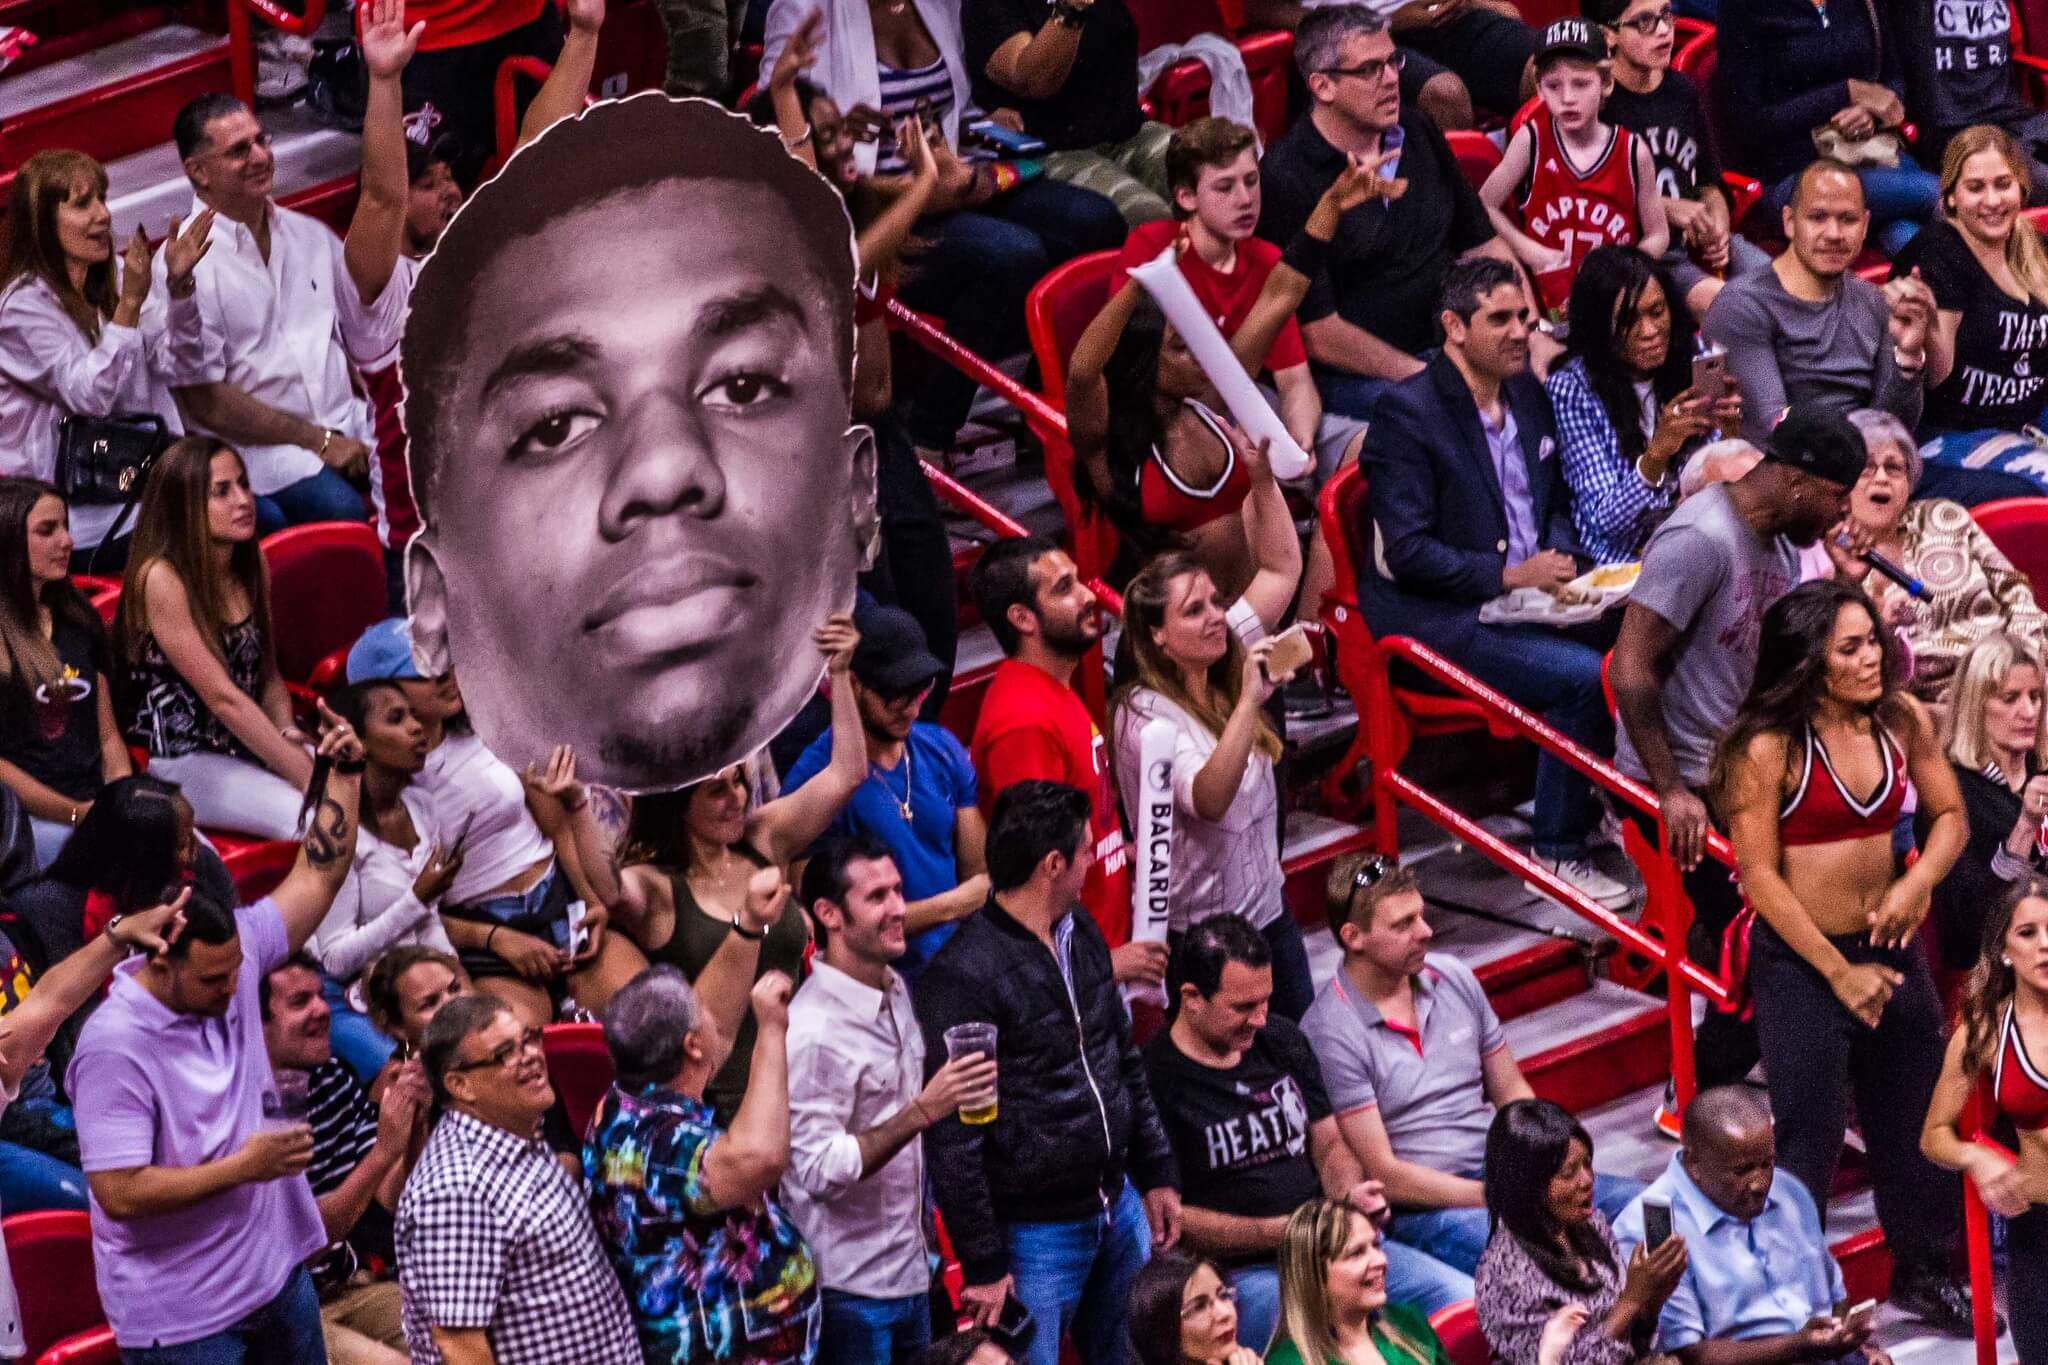 Miami Heat fans